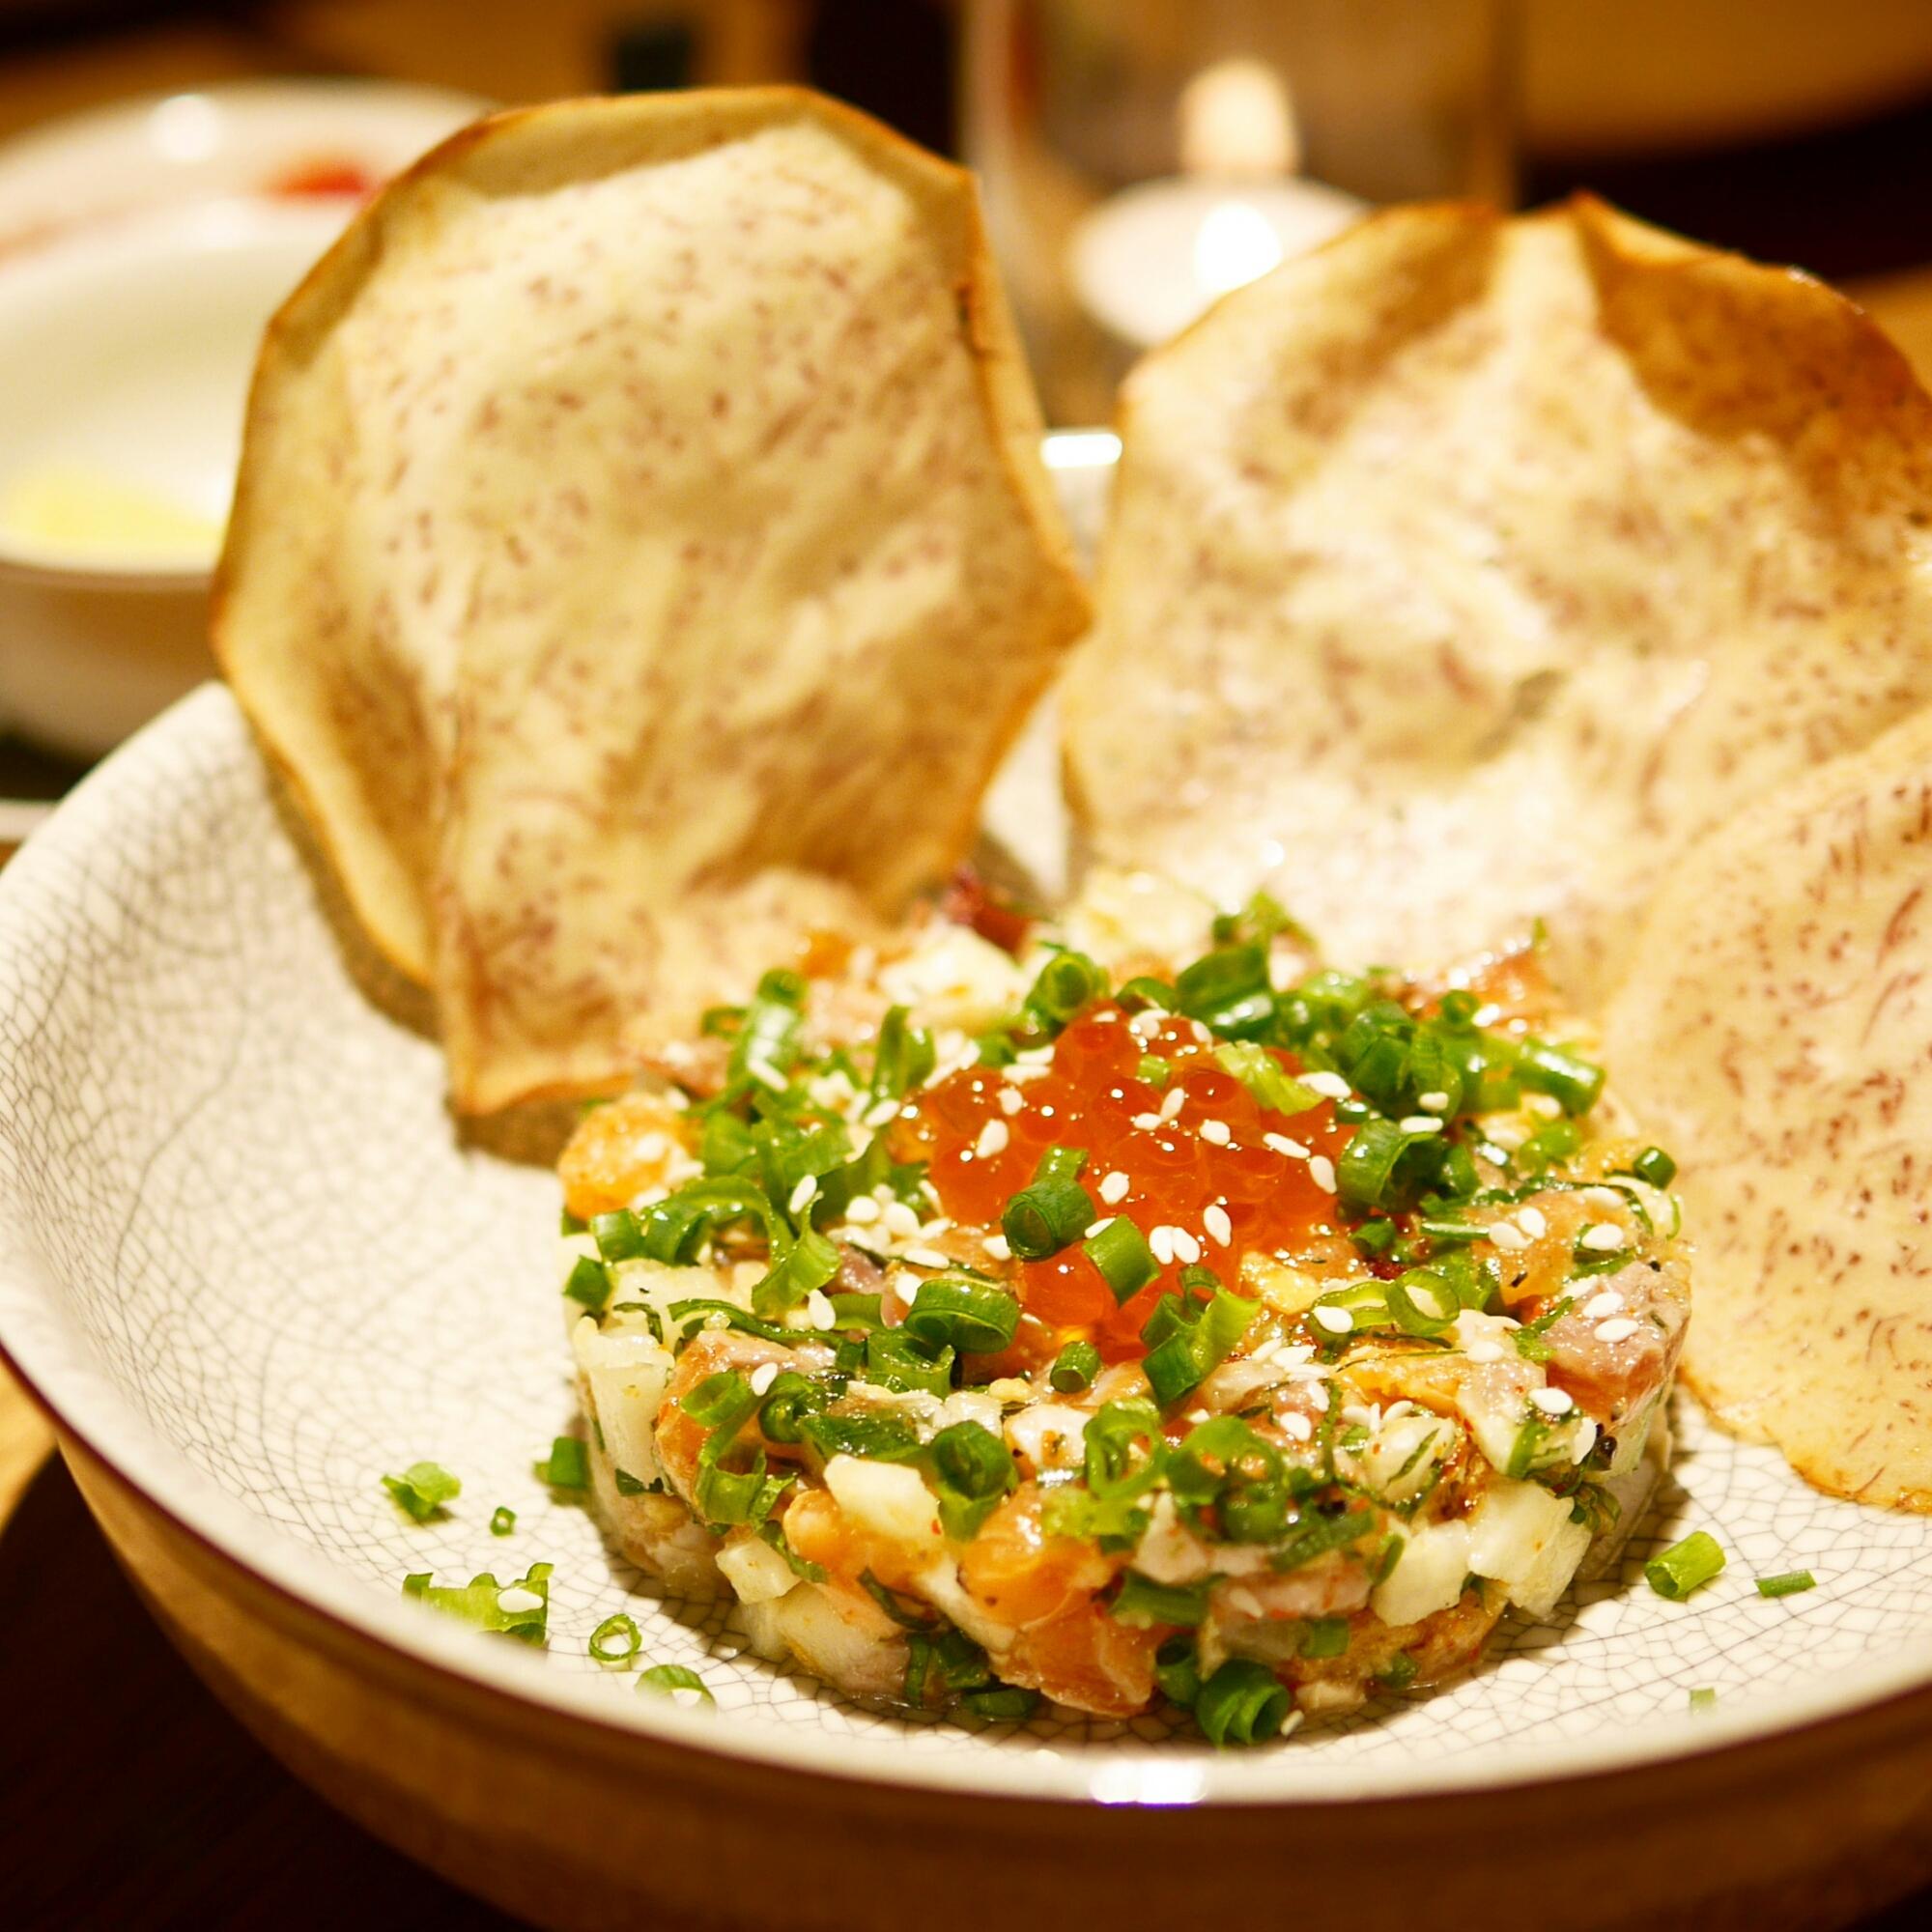 Viet Kitchen: New Menu Items Better than the Pho